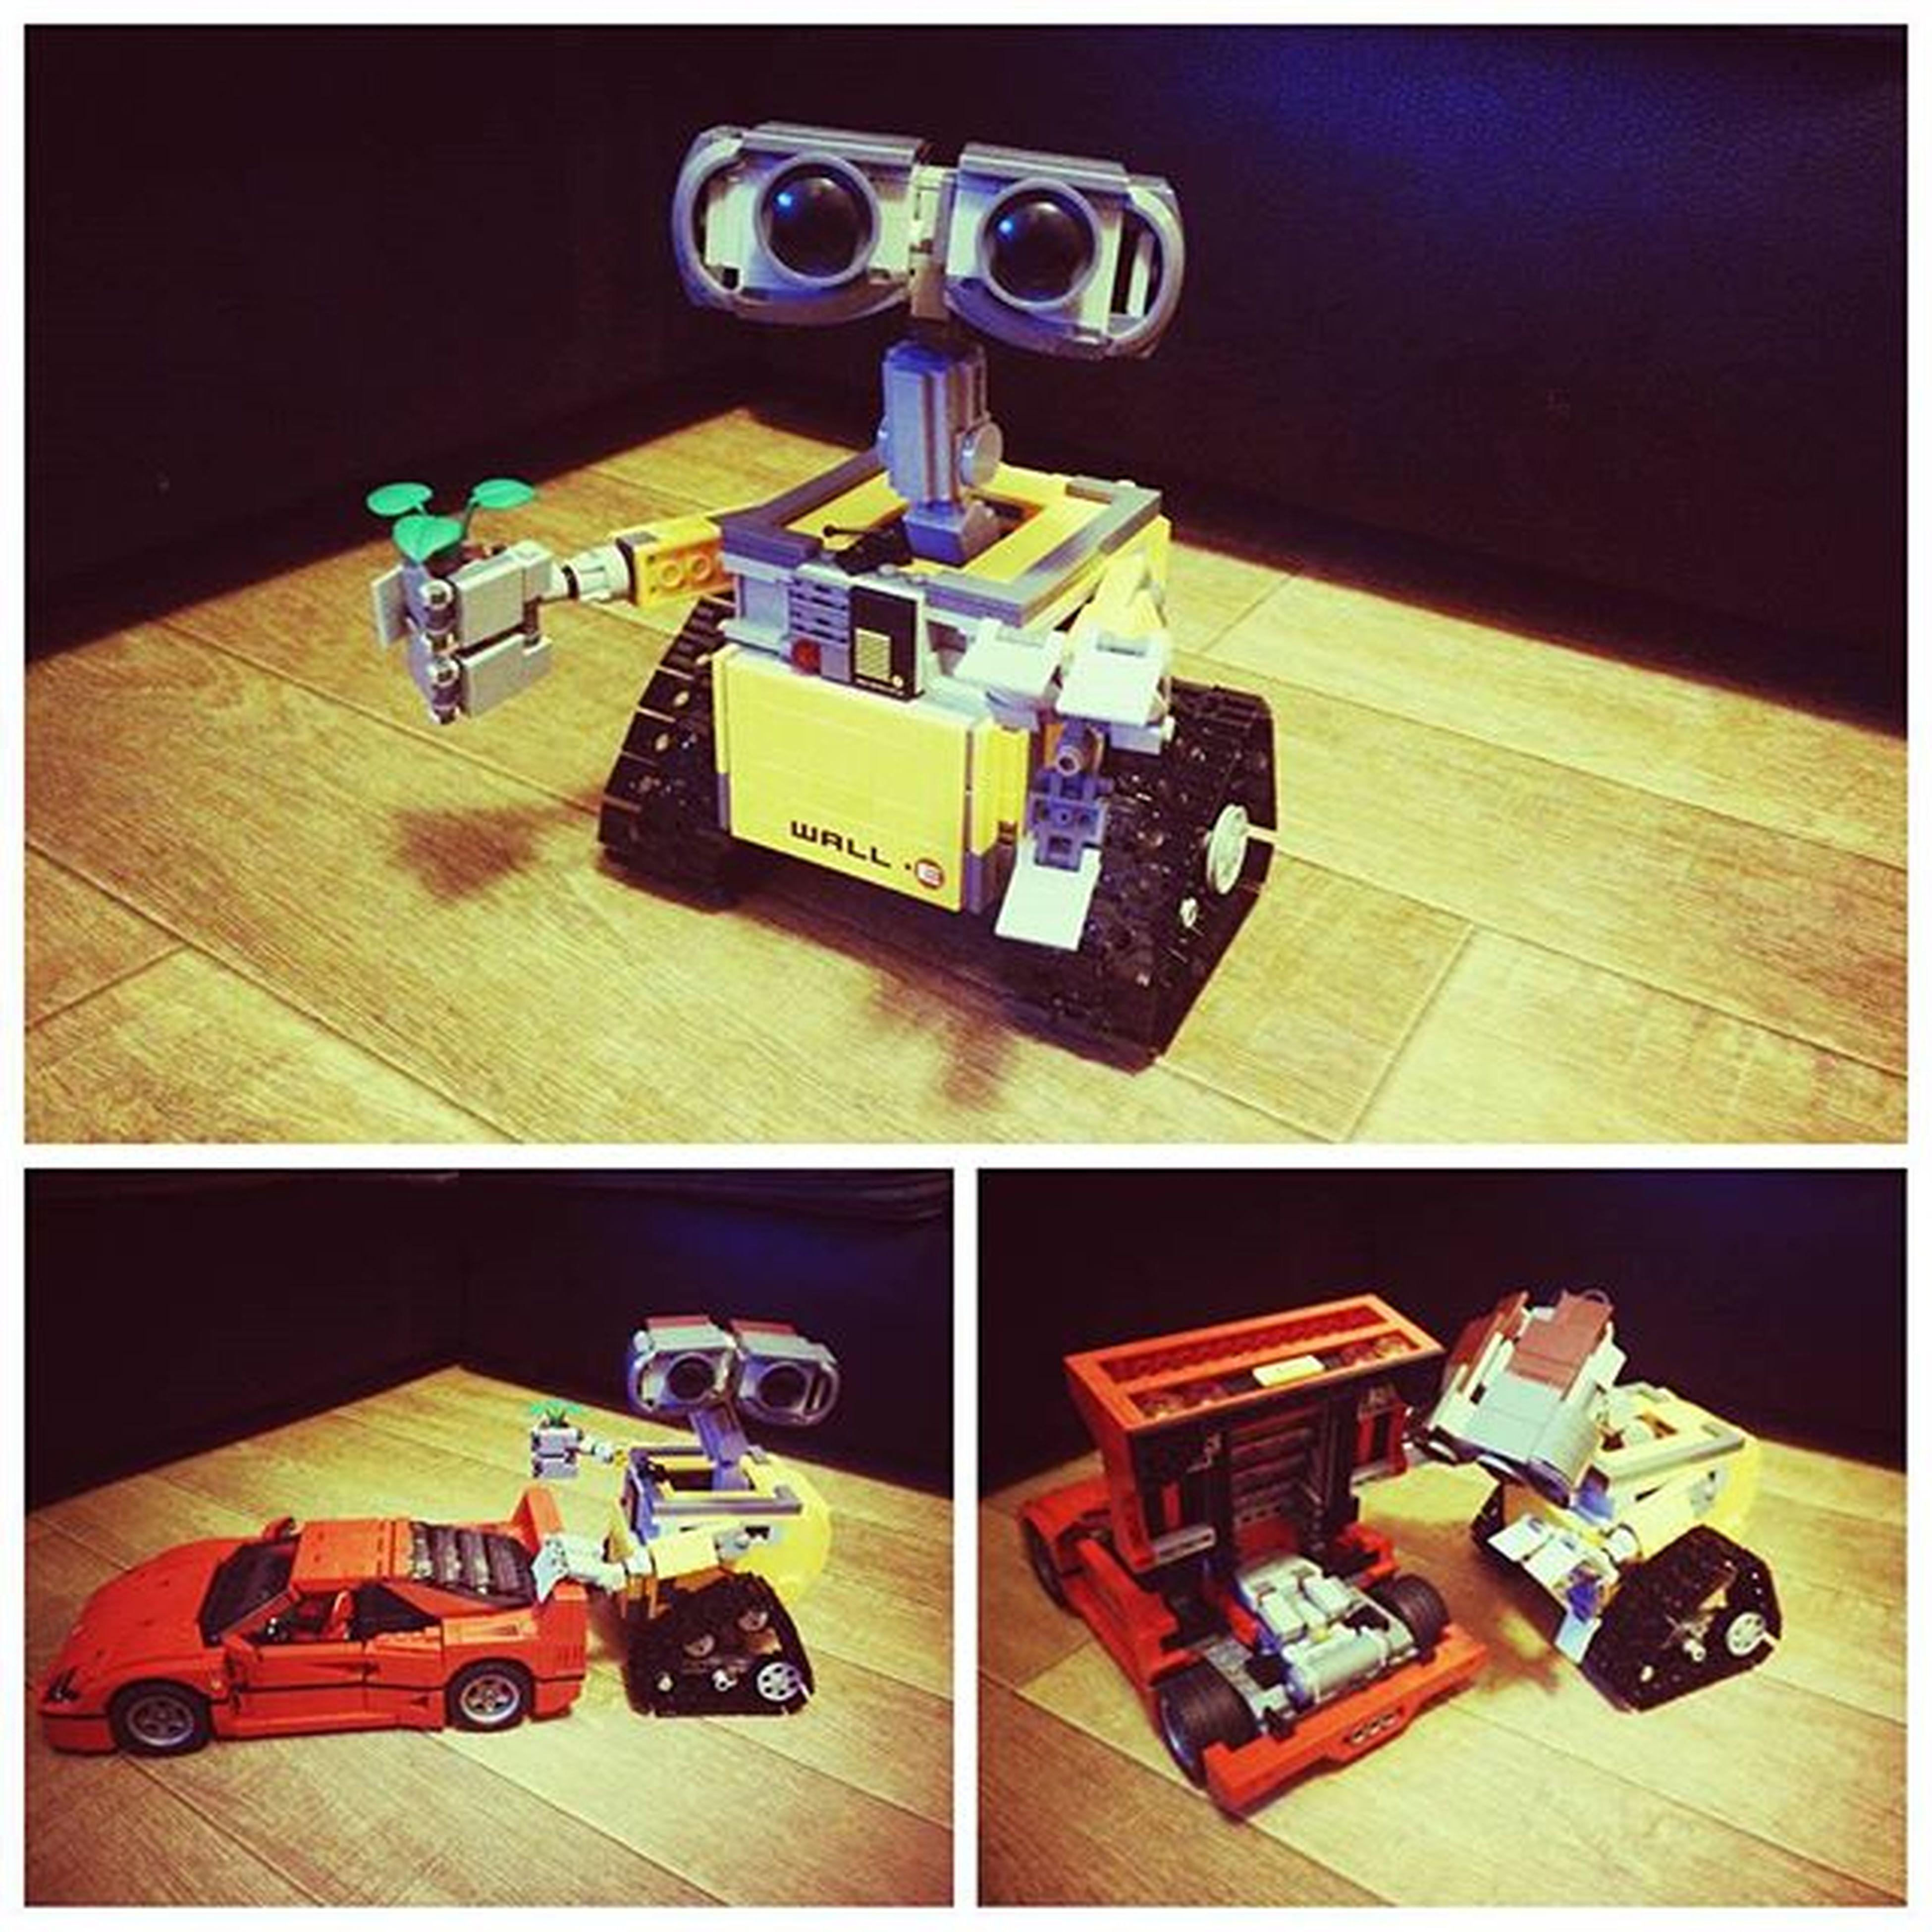 Lego Wall-E and the F40 😀 Legostagram LEGO Ferrarif40 Legowalle Gladihavekids Legoferrari WallE